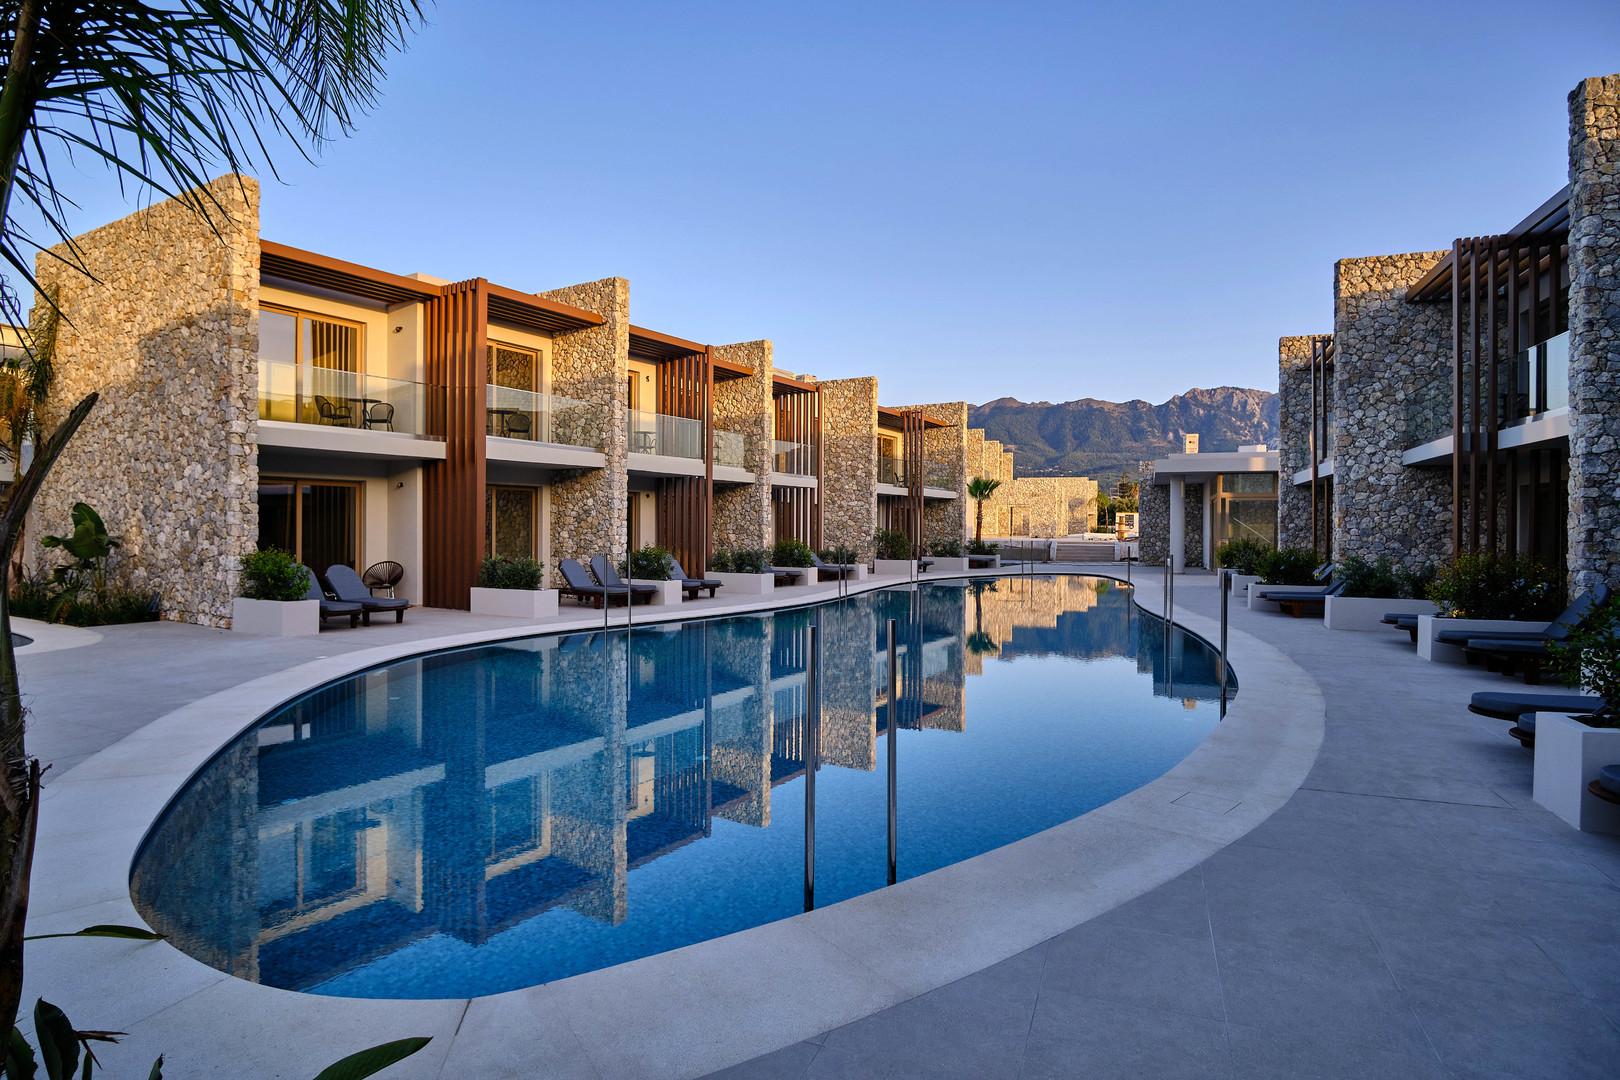 Hotel Utopia Blu